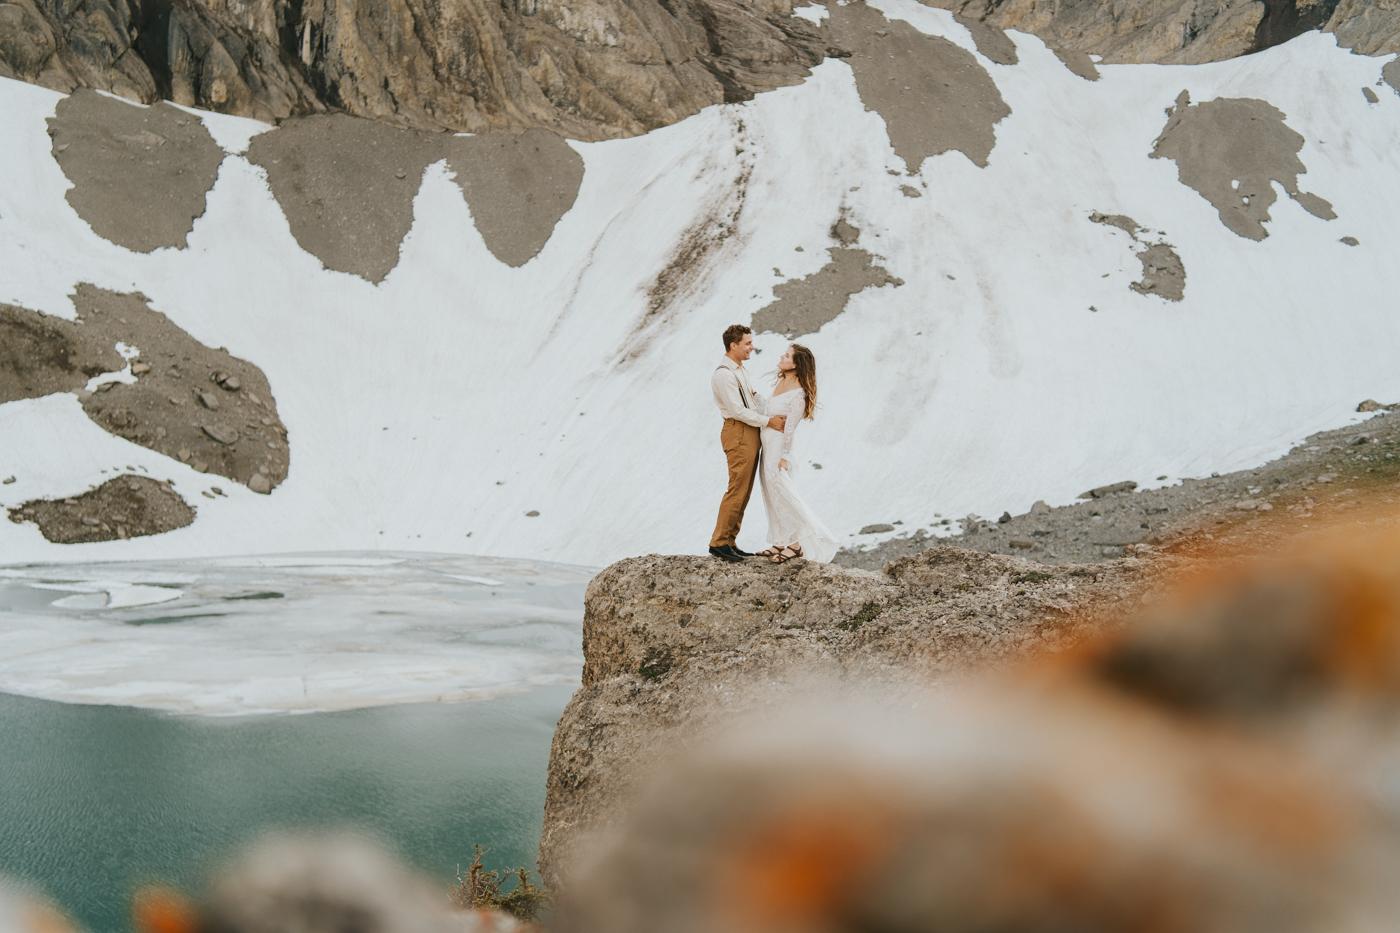 tyraephotography_photographer_wedding_elopement_engagement_photography-07791.jpg